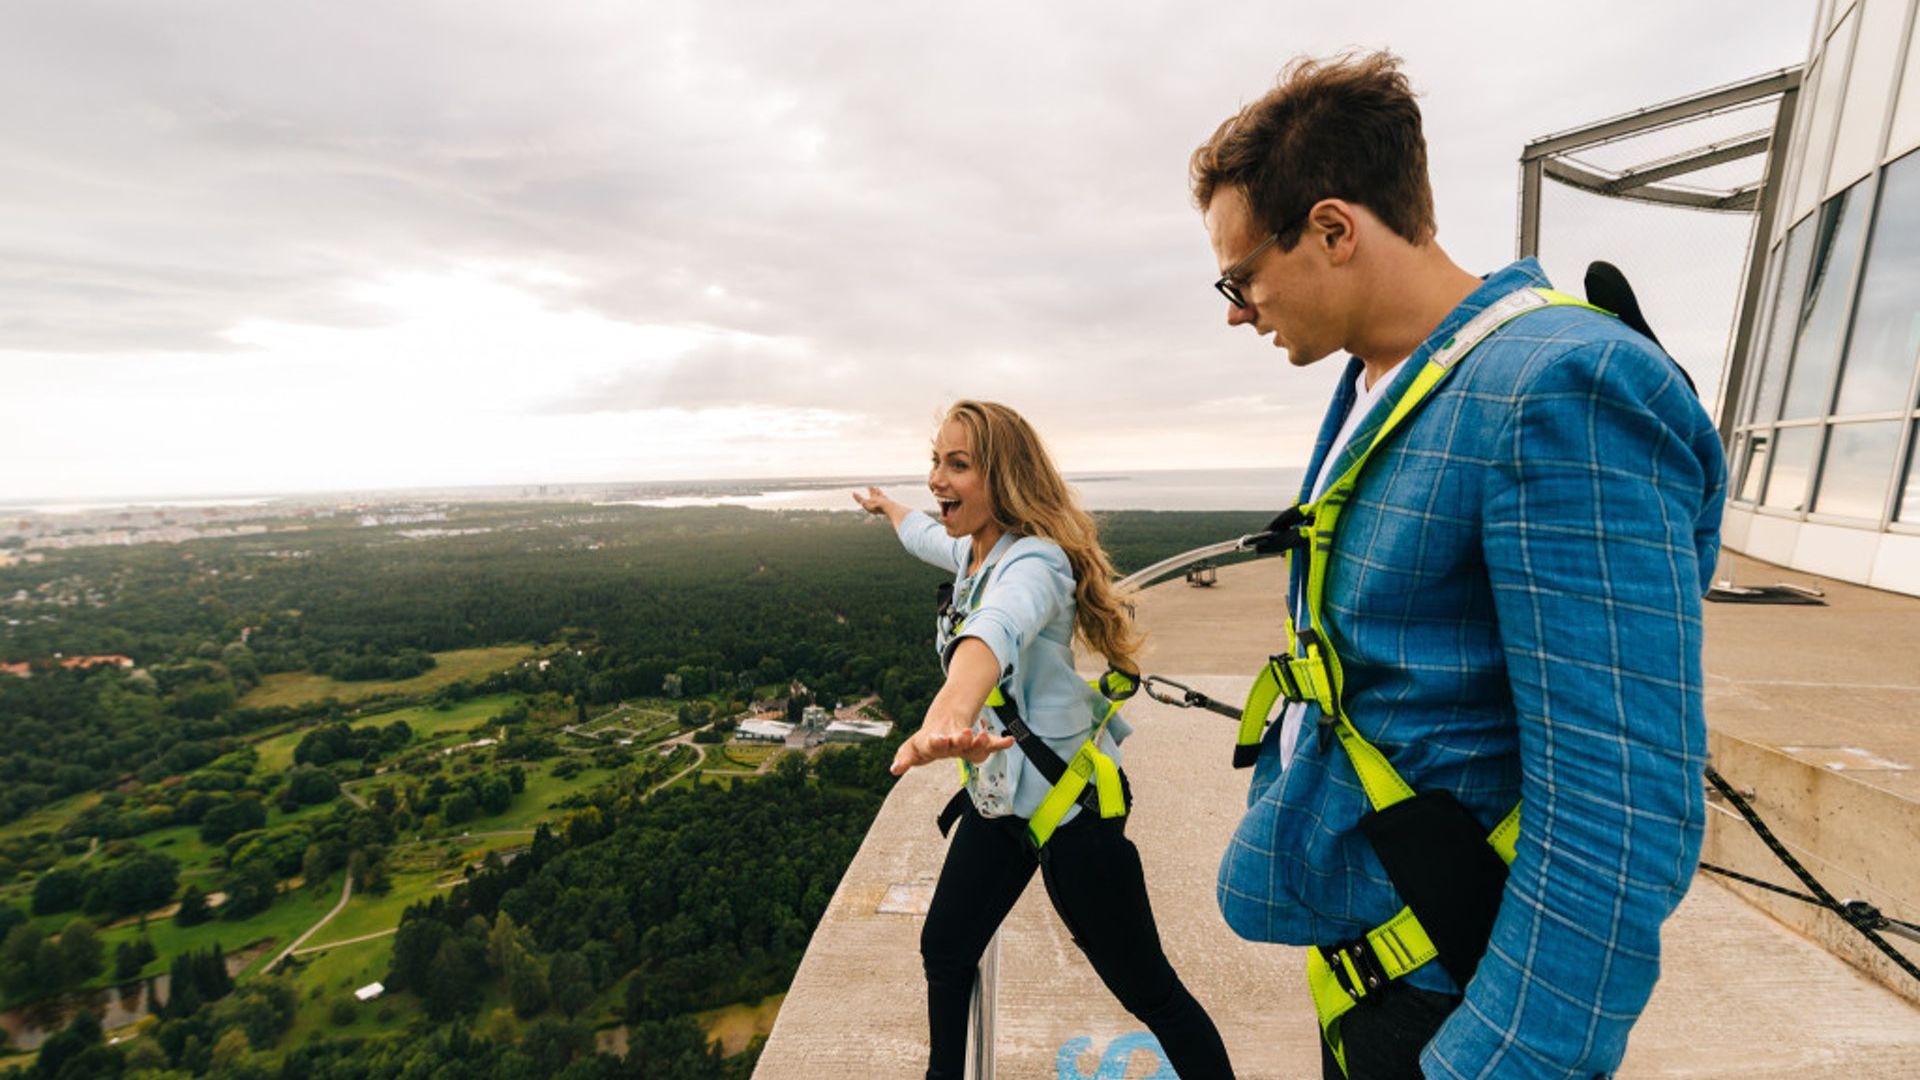 Tallinn TV Tower: Walk on the Edge